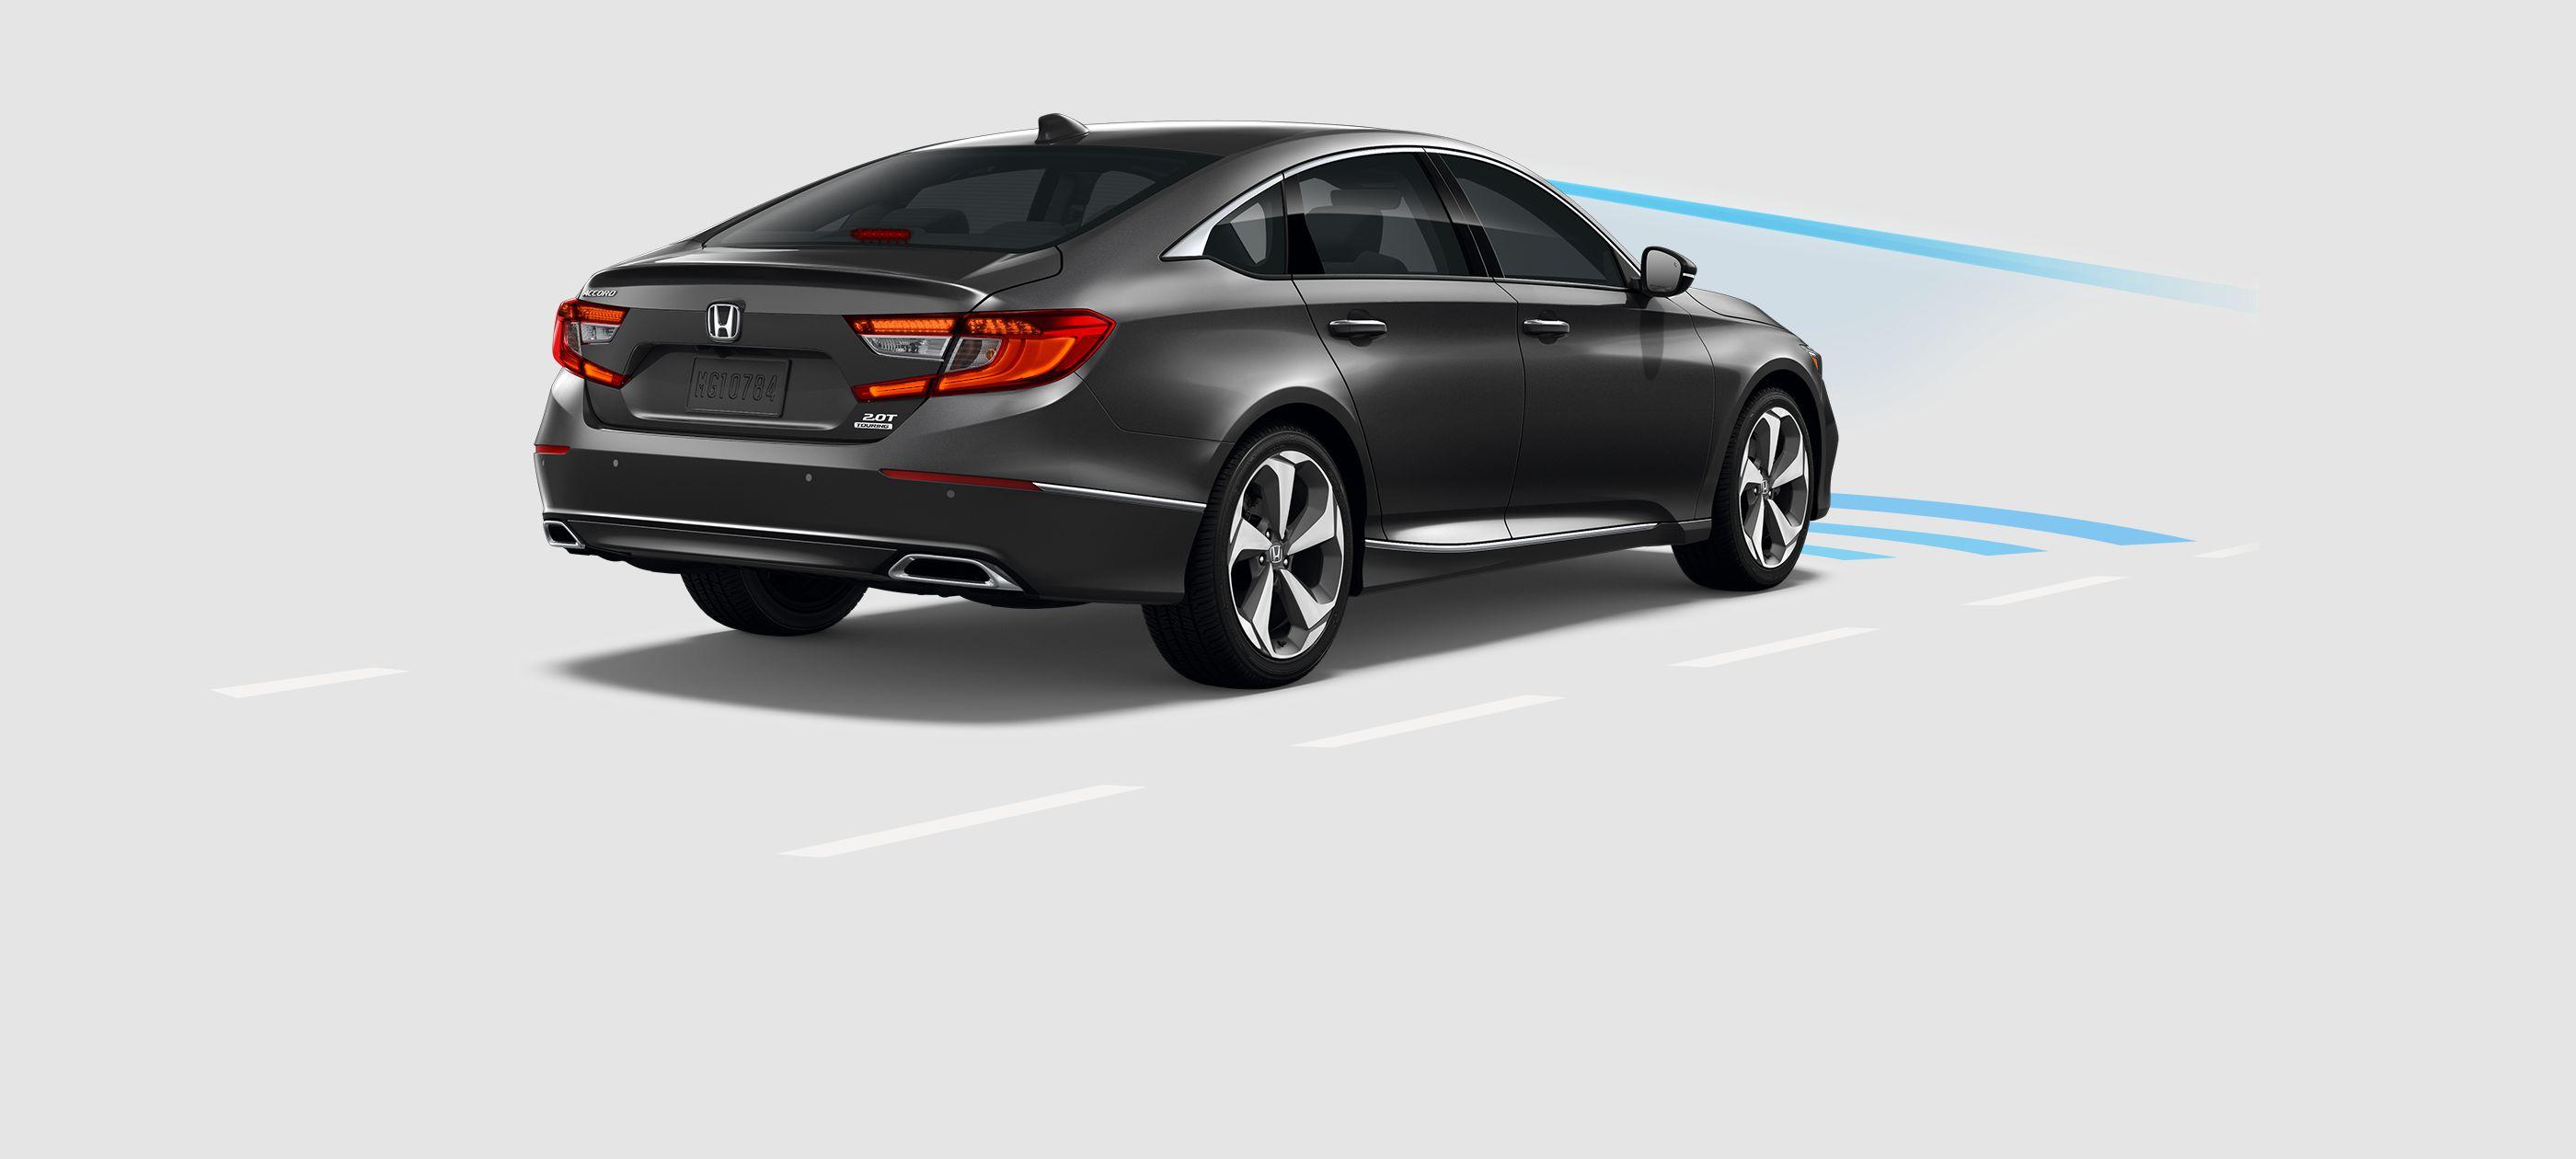 New Honda Accord Specs And Pricing East Coast Myrtle Beach Saturn Vue Cvt Fluid Collision Mitigation Braking System